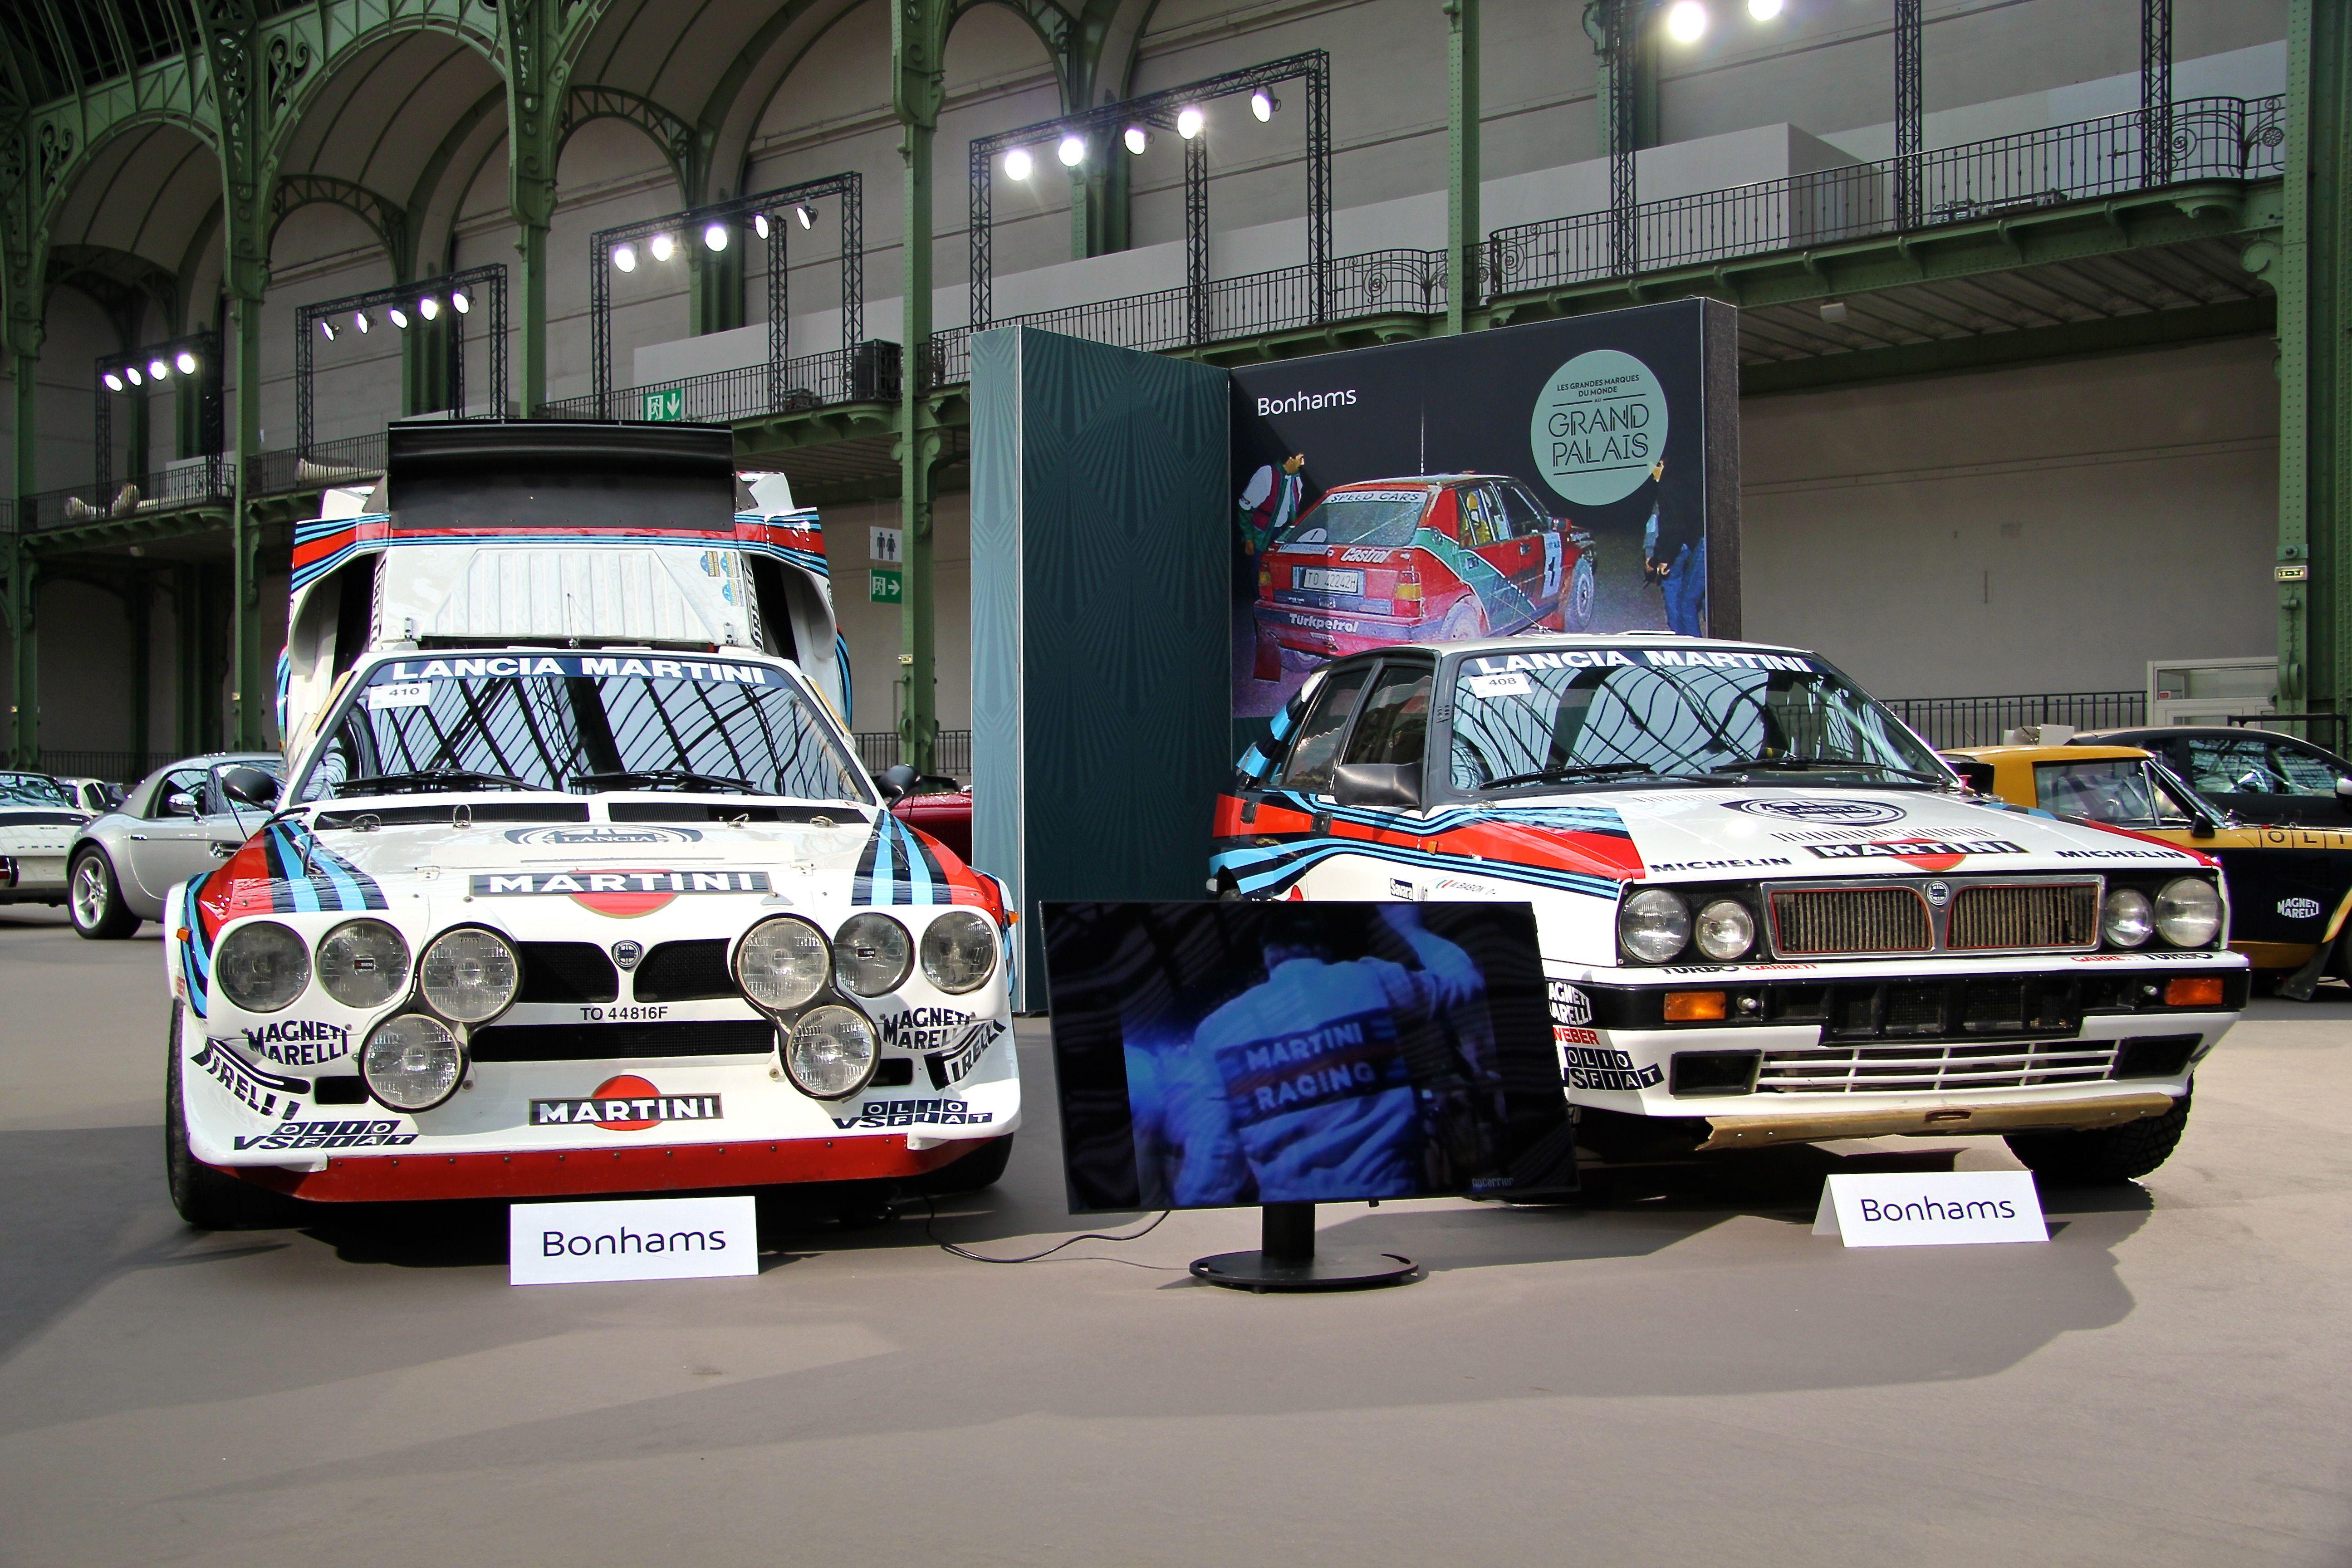 Lancia Delta S4 GrpB - 1986 - Lancia Delta Integrale GrpA - 1988 - Retromobile - Bonhams - 2018 - photo Ludo Ferrari